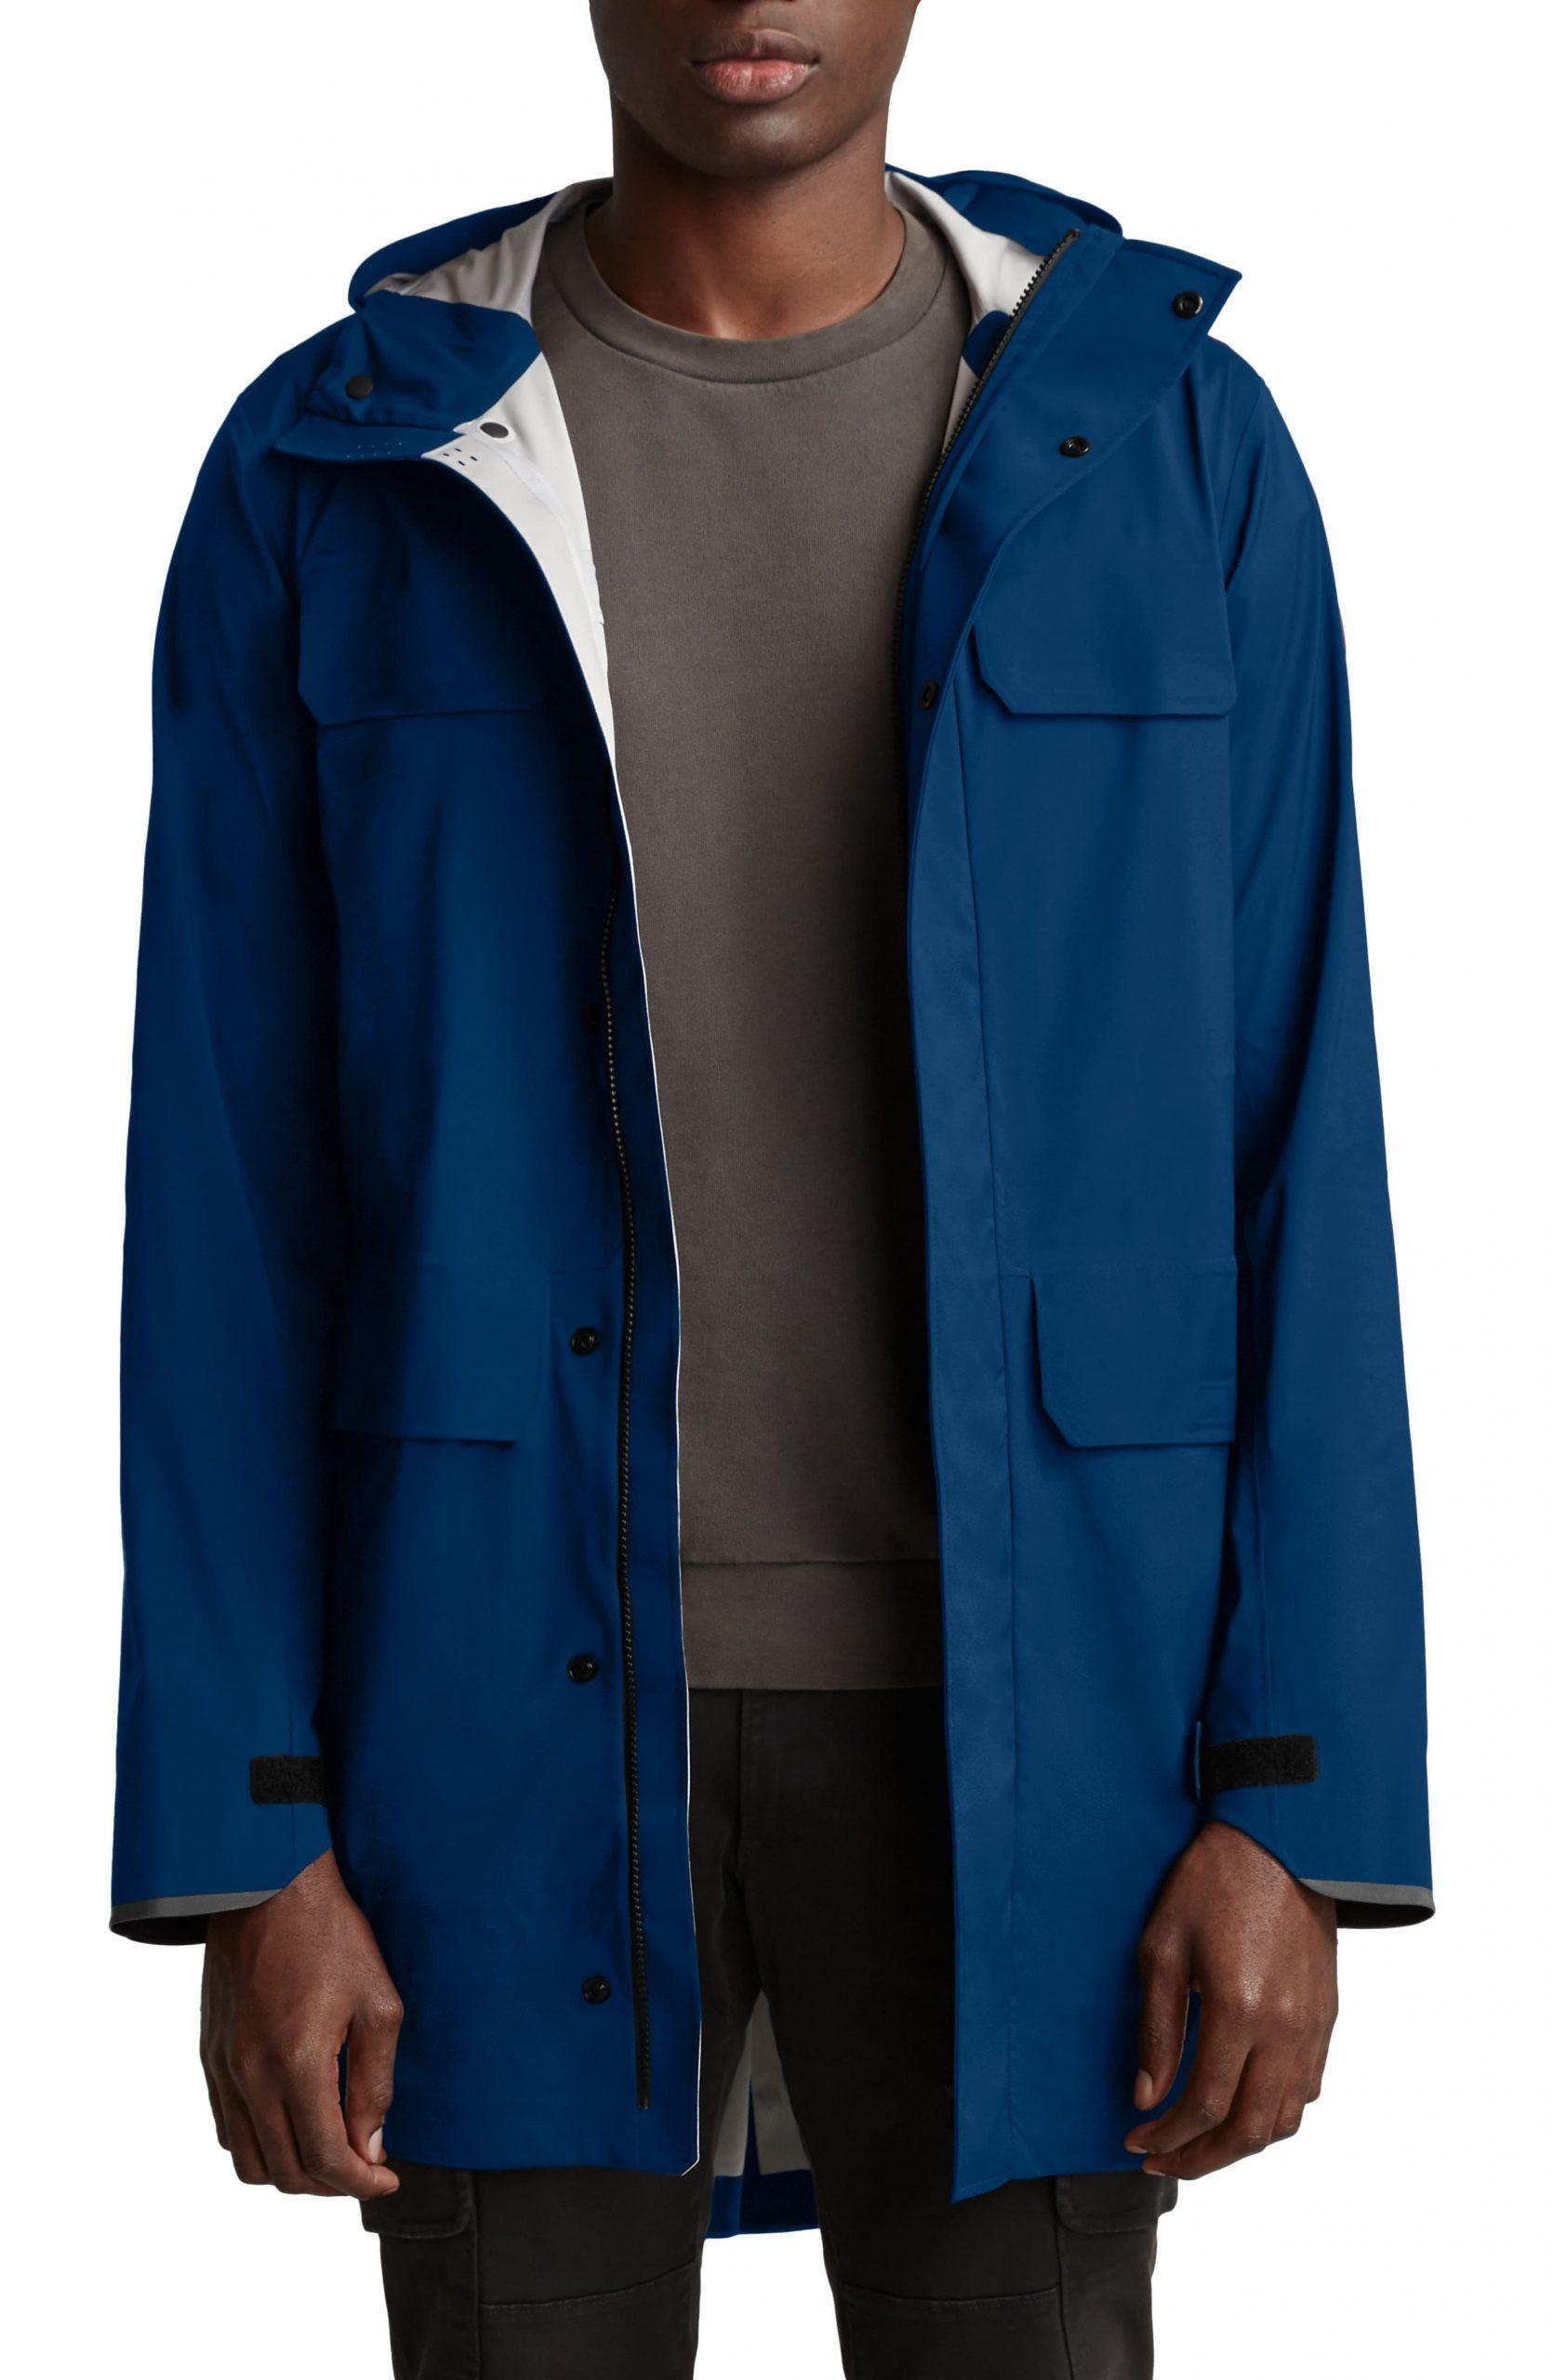 Men's Canada Goose Seawolf Packable Waterproof Jacket, Size Medium - Blue